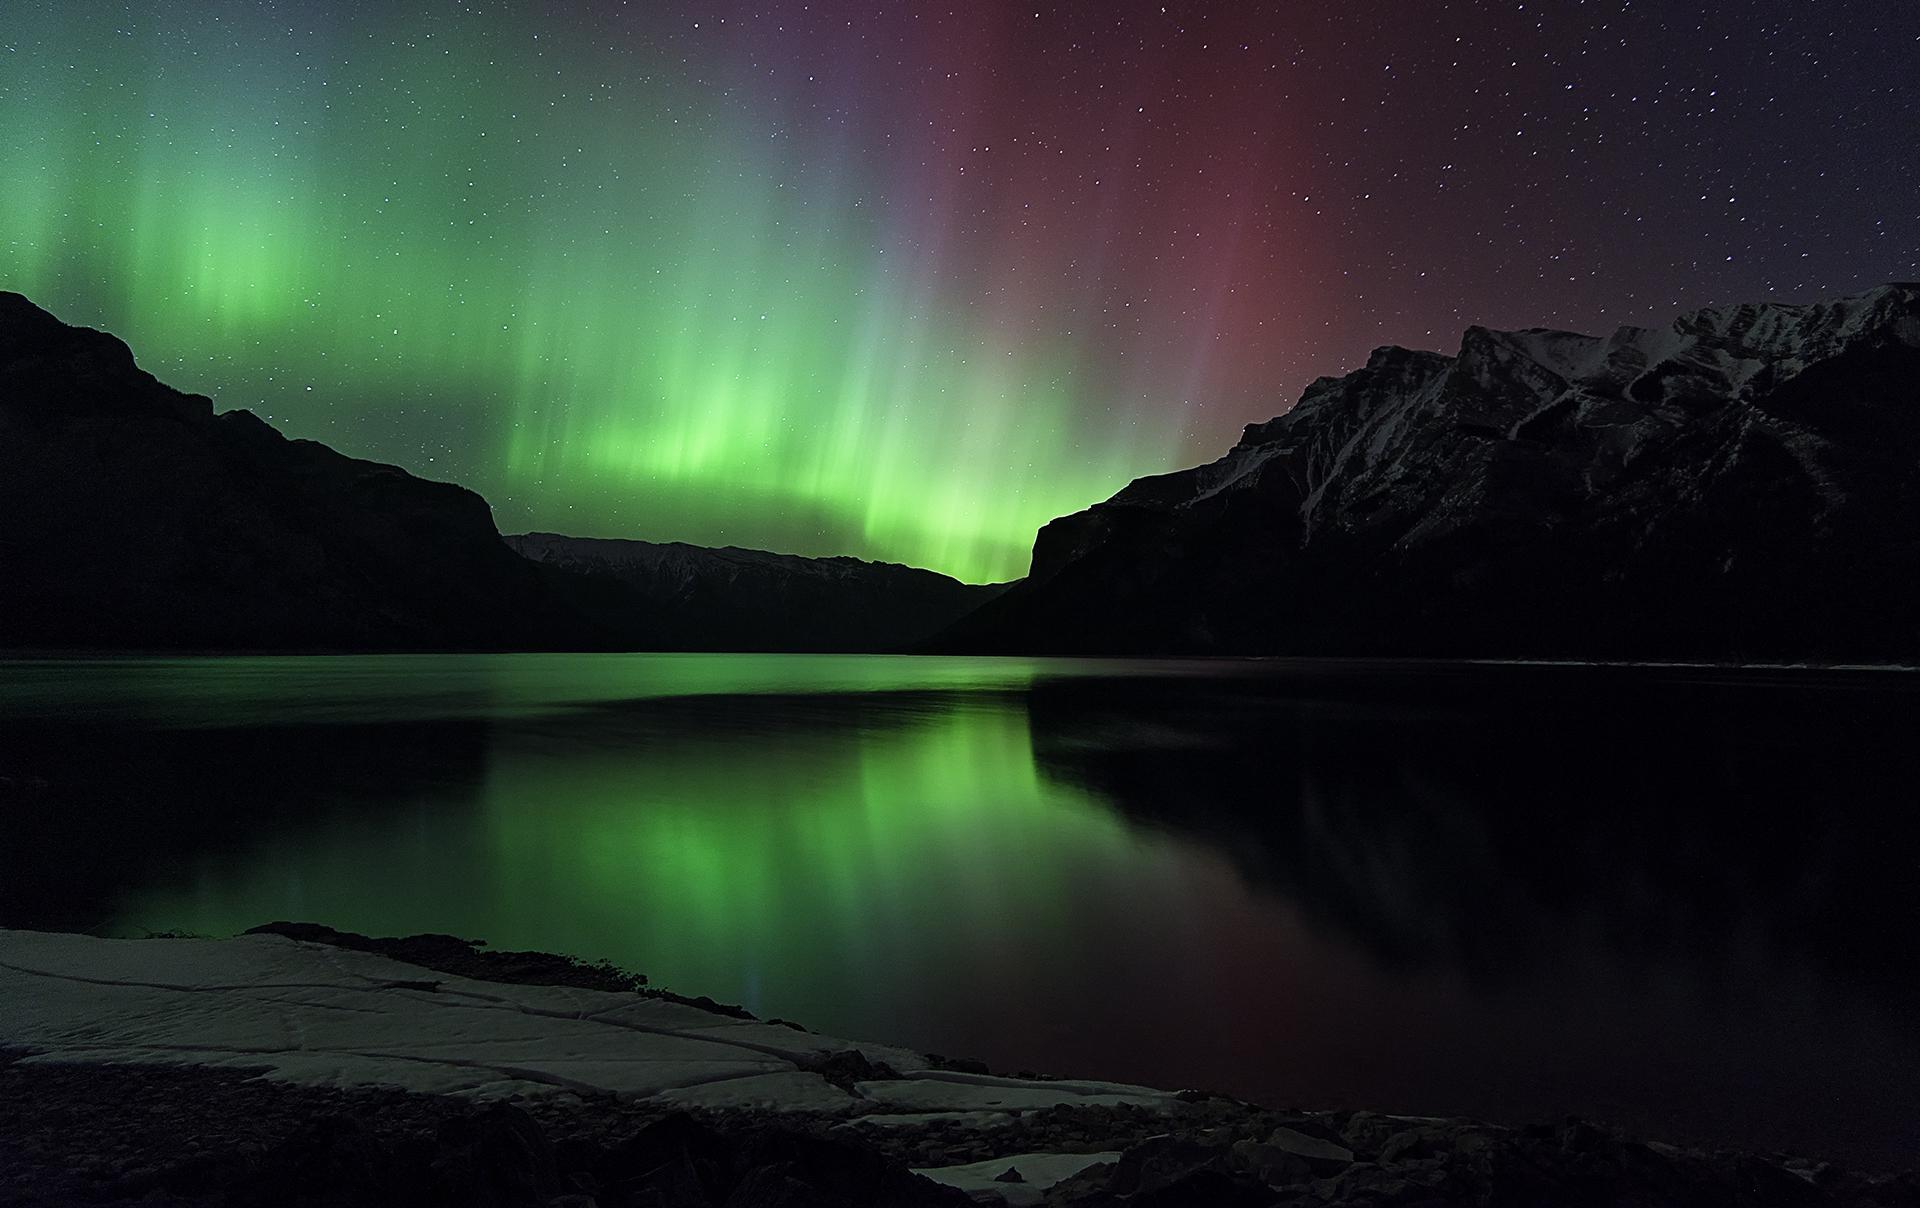 210111-space-weather-aurora-borealis-esa-banner.jpg